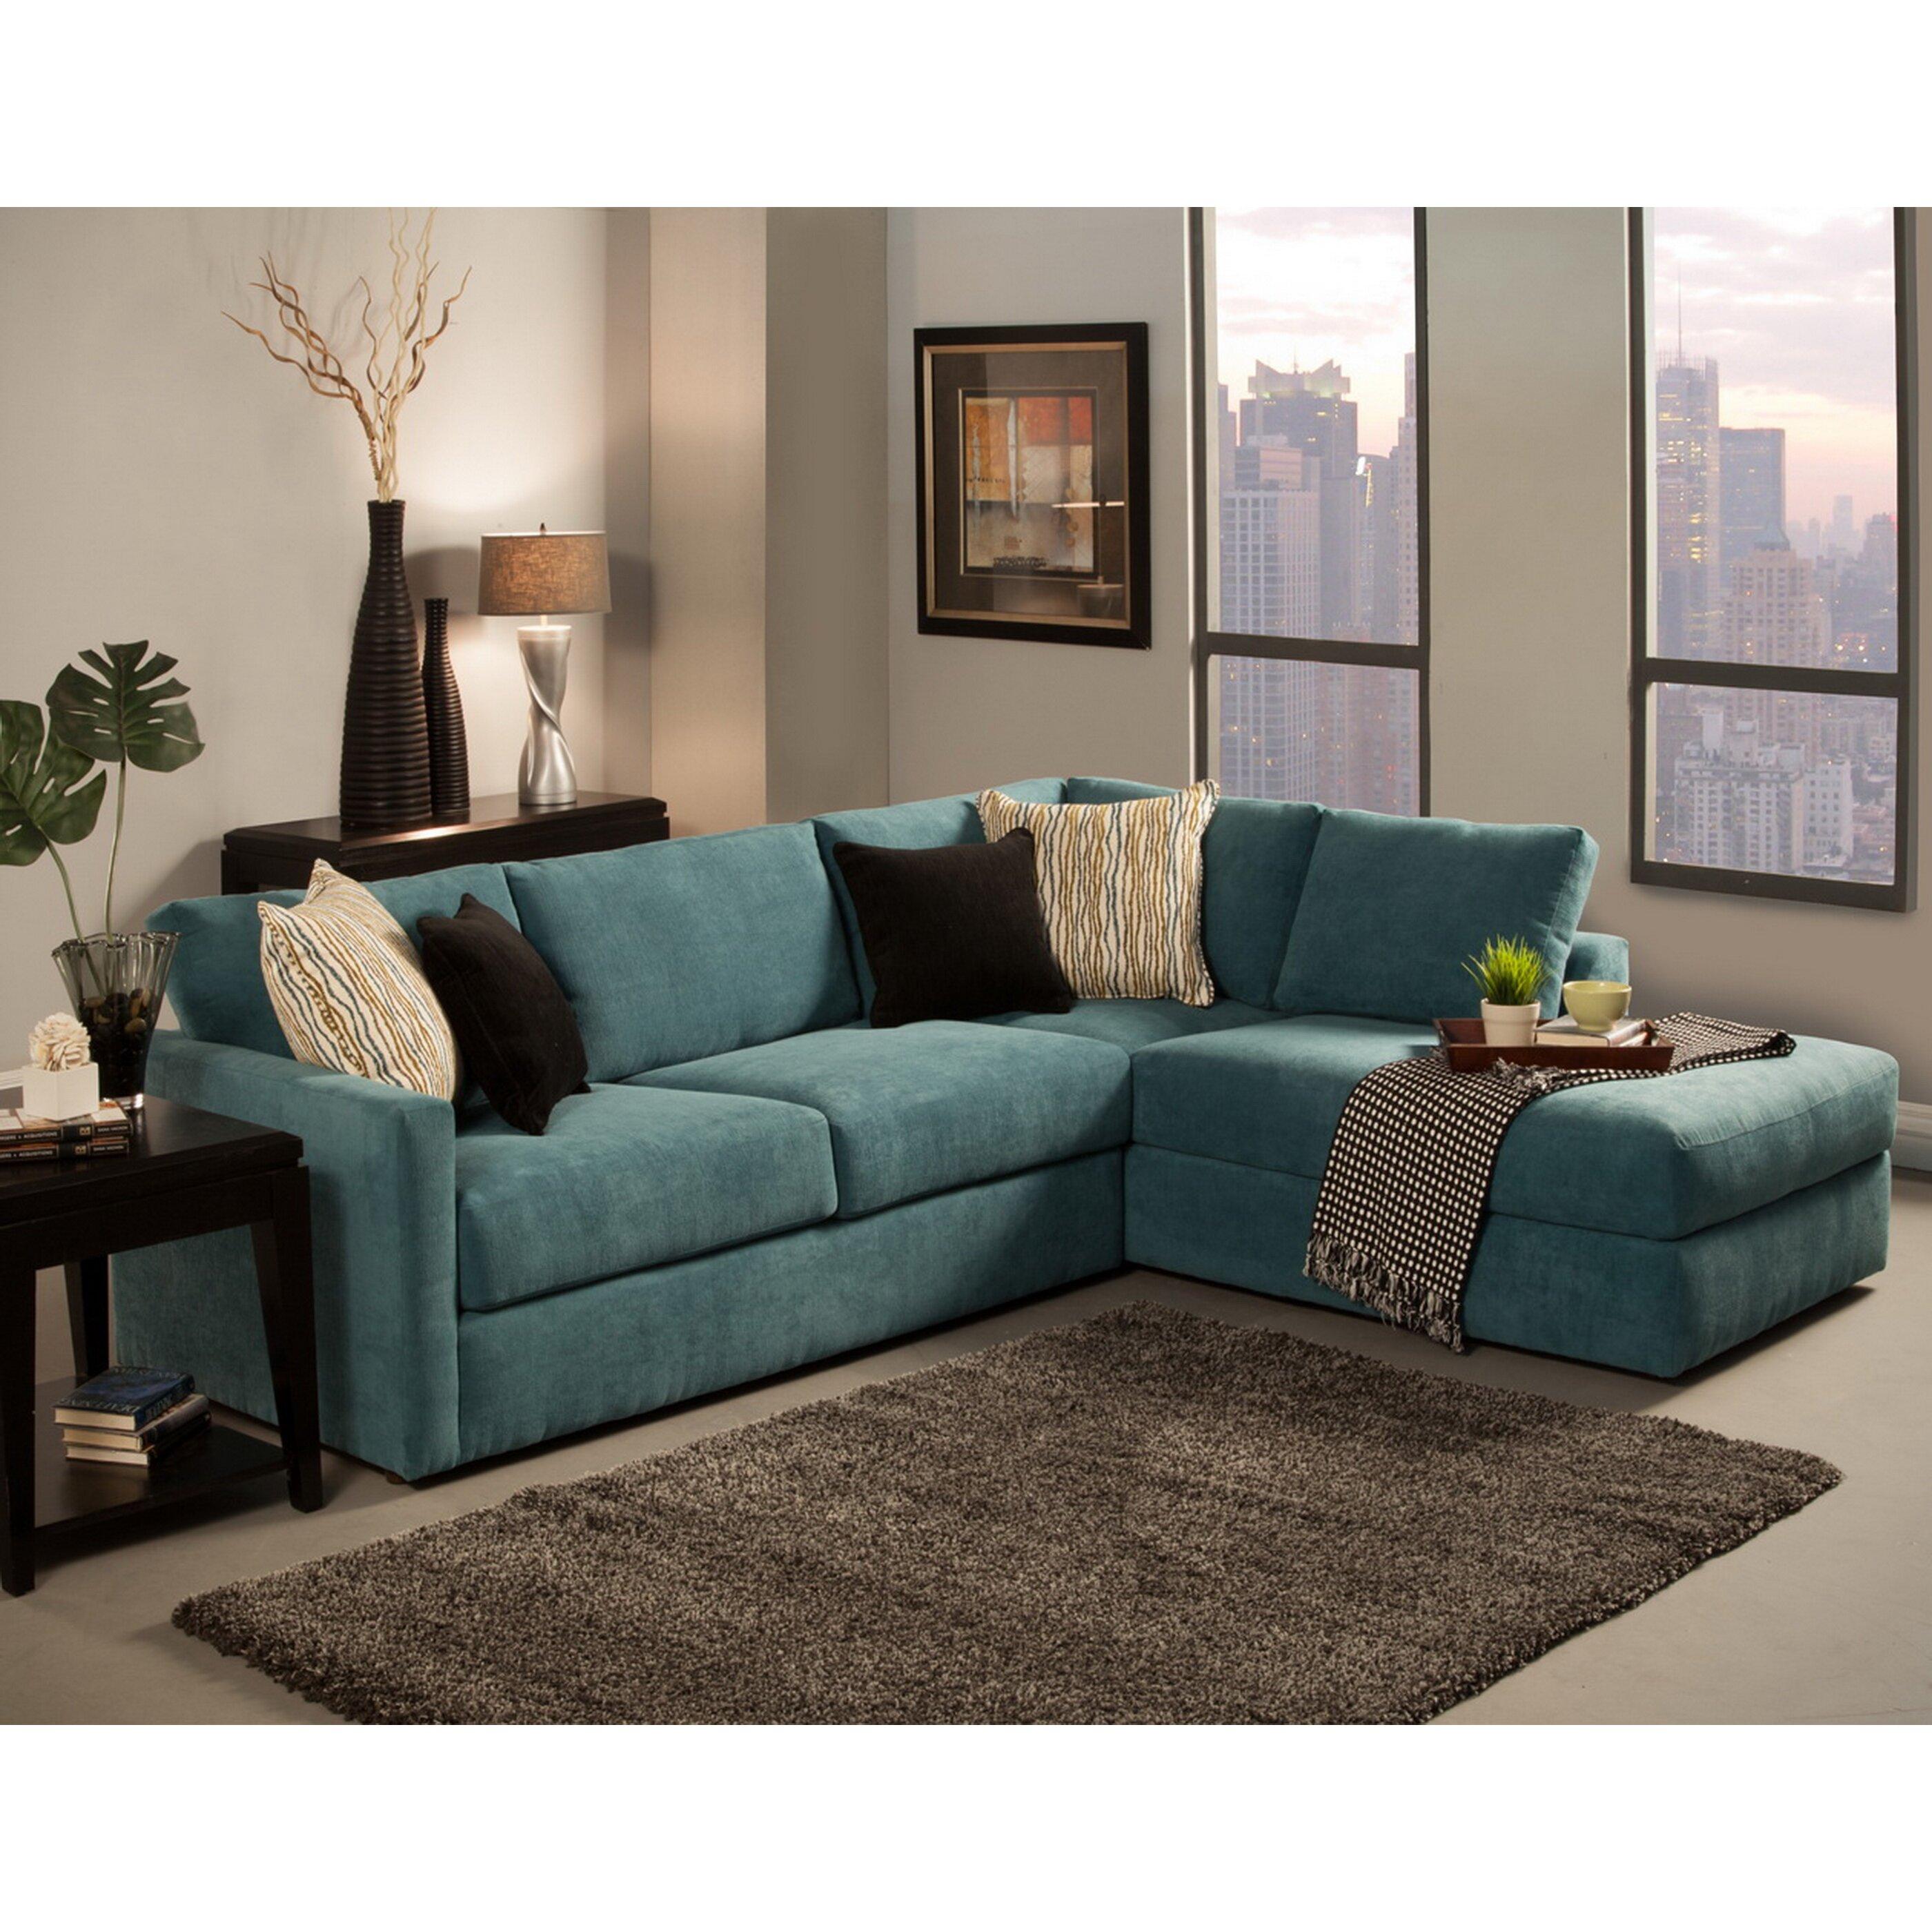 Hokku designs ostala sectional reviews for Hokku designs living room furniture